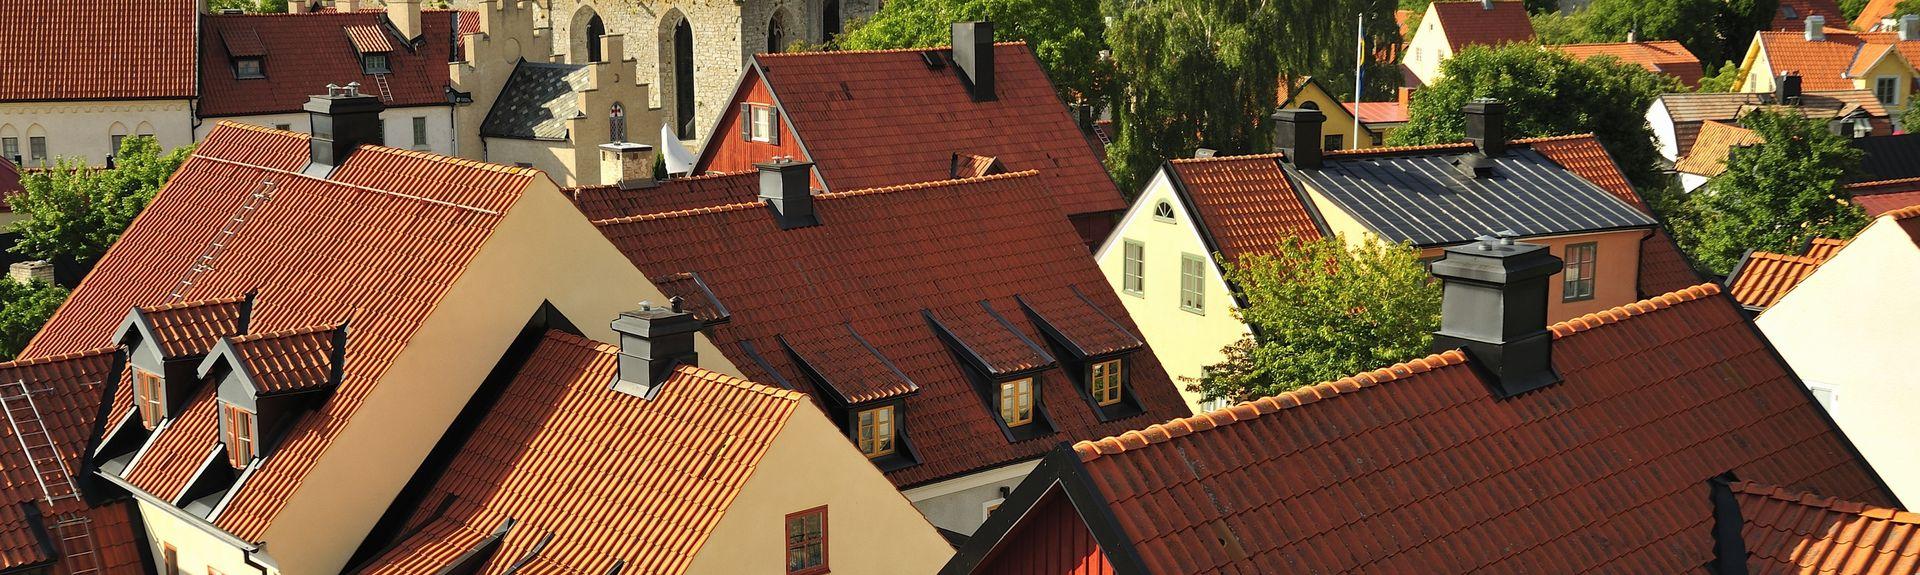 Gotland Municipality, Gotland County, Sweden